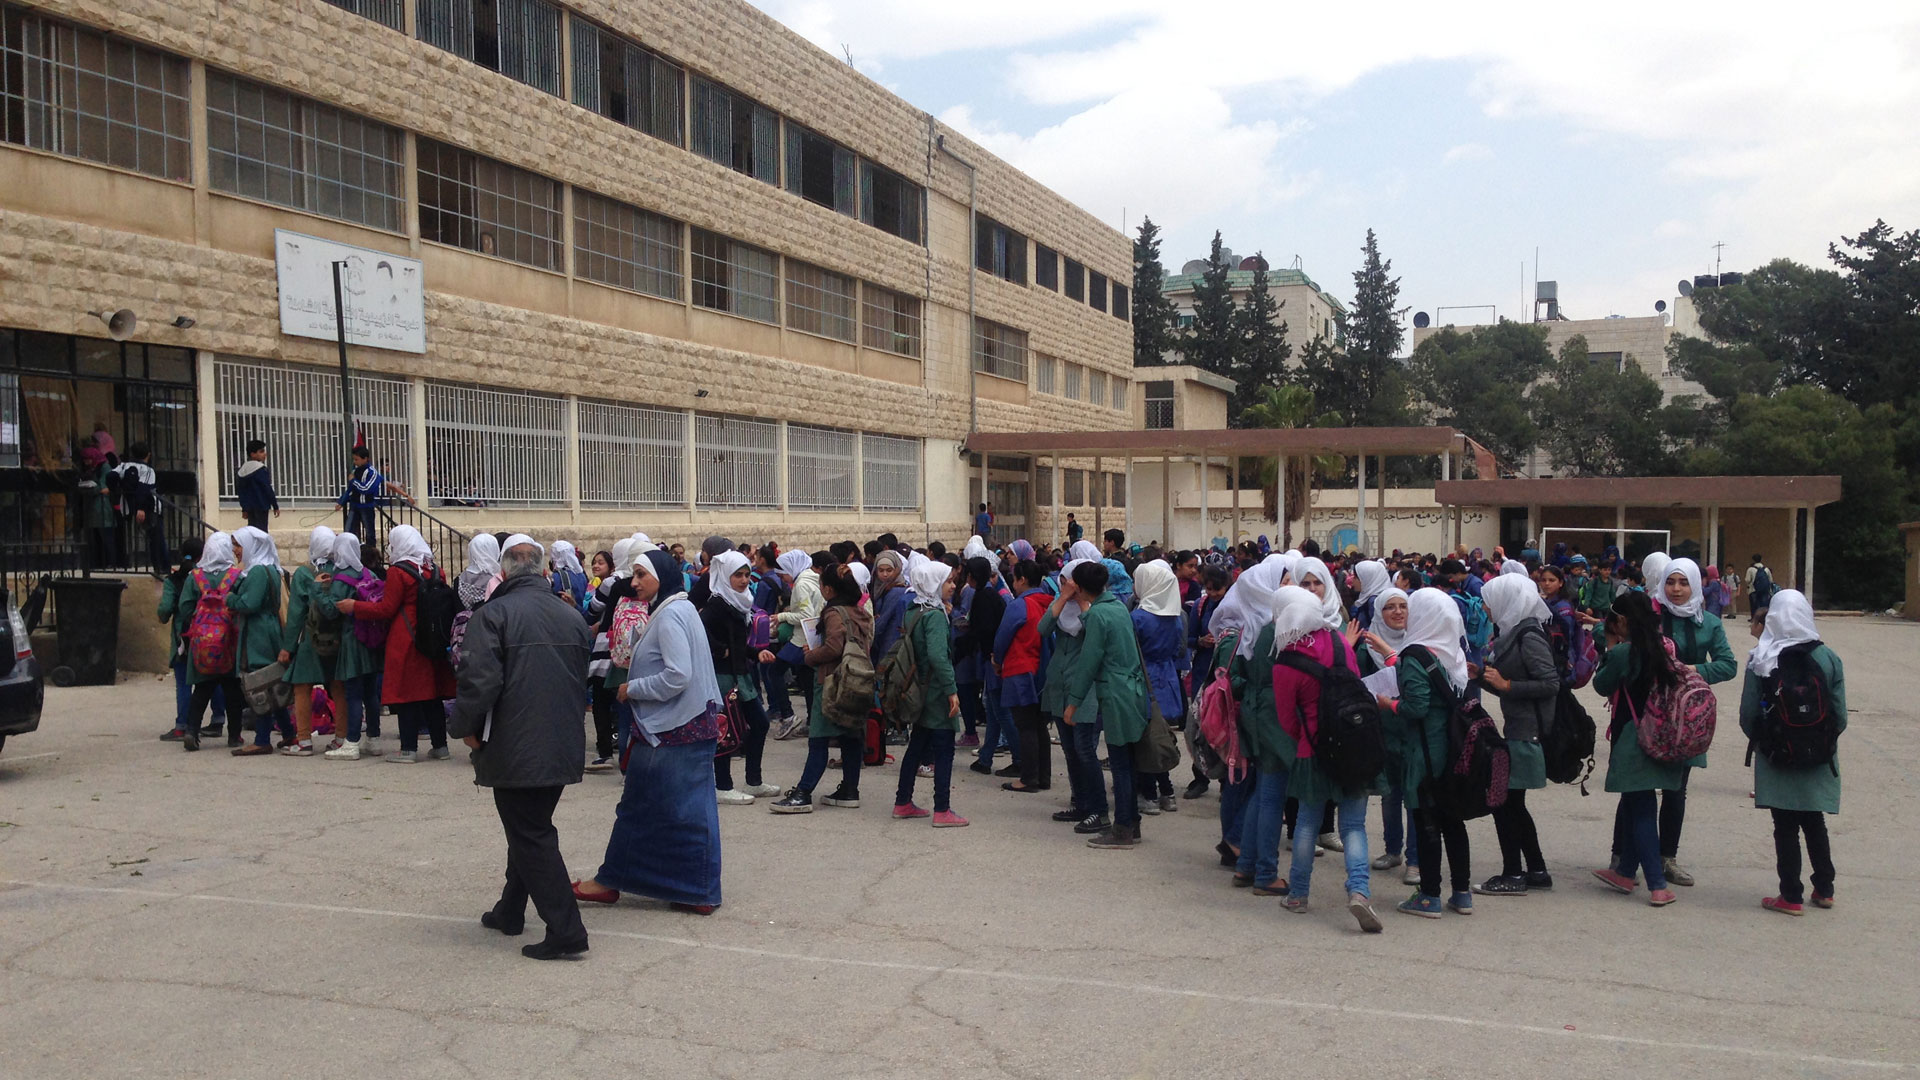 Die Al Quds Schule in Amman, Jordanien